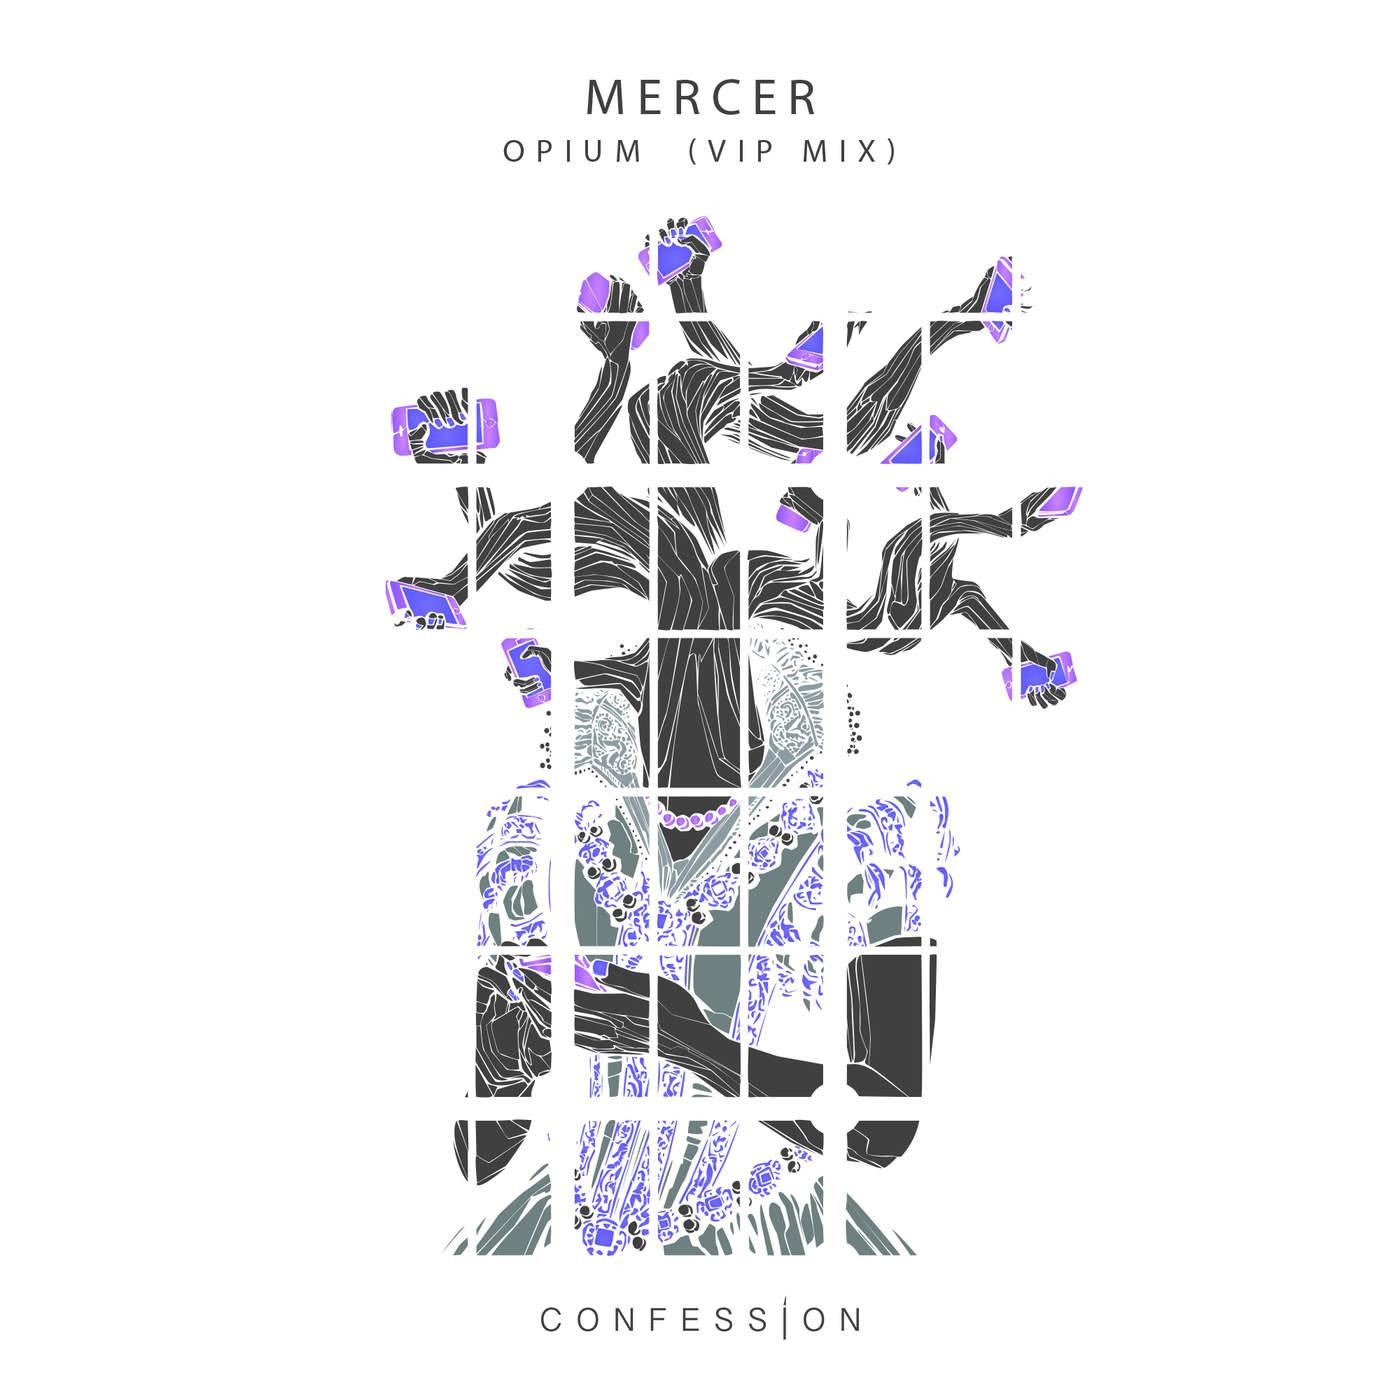 Mercer - Opium (Vip Mix) - Single Cover